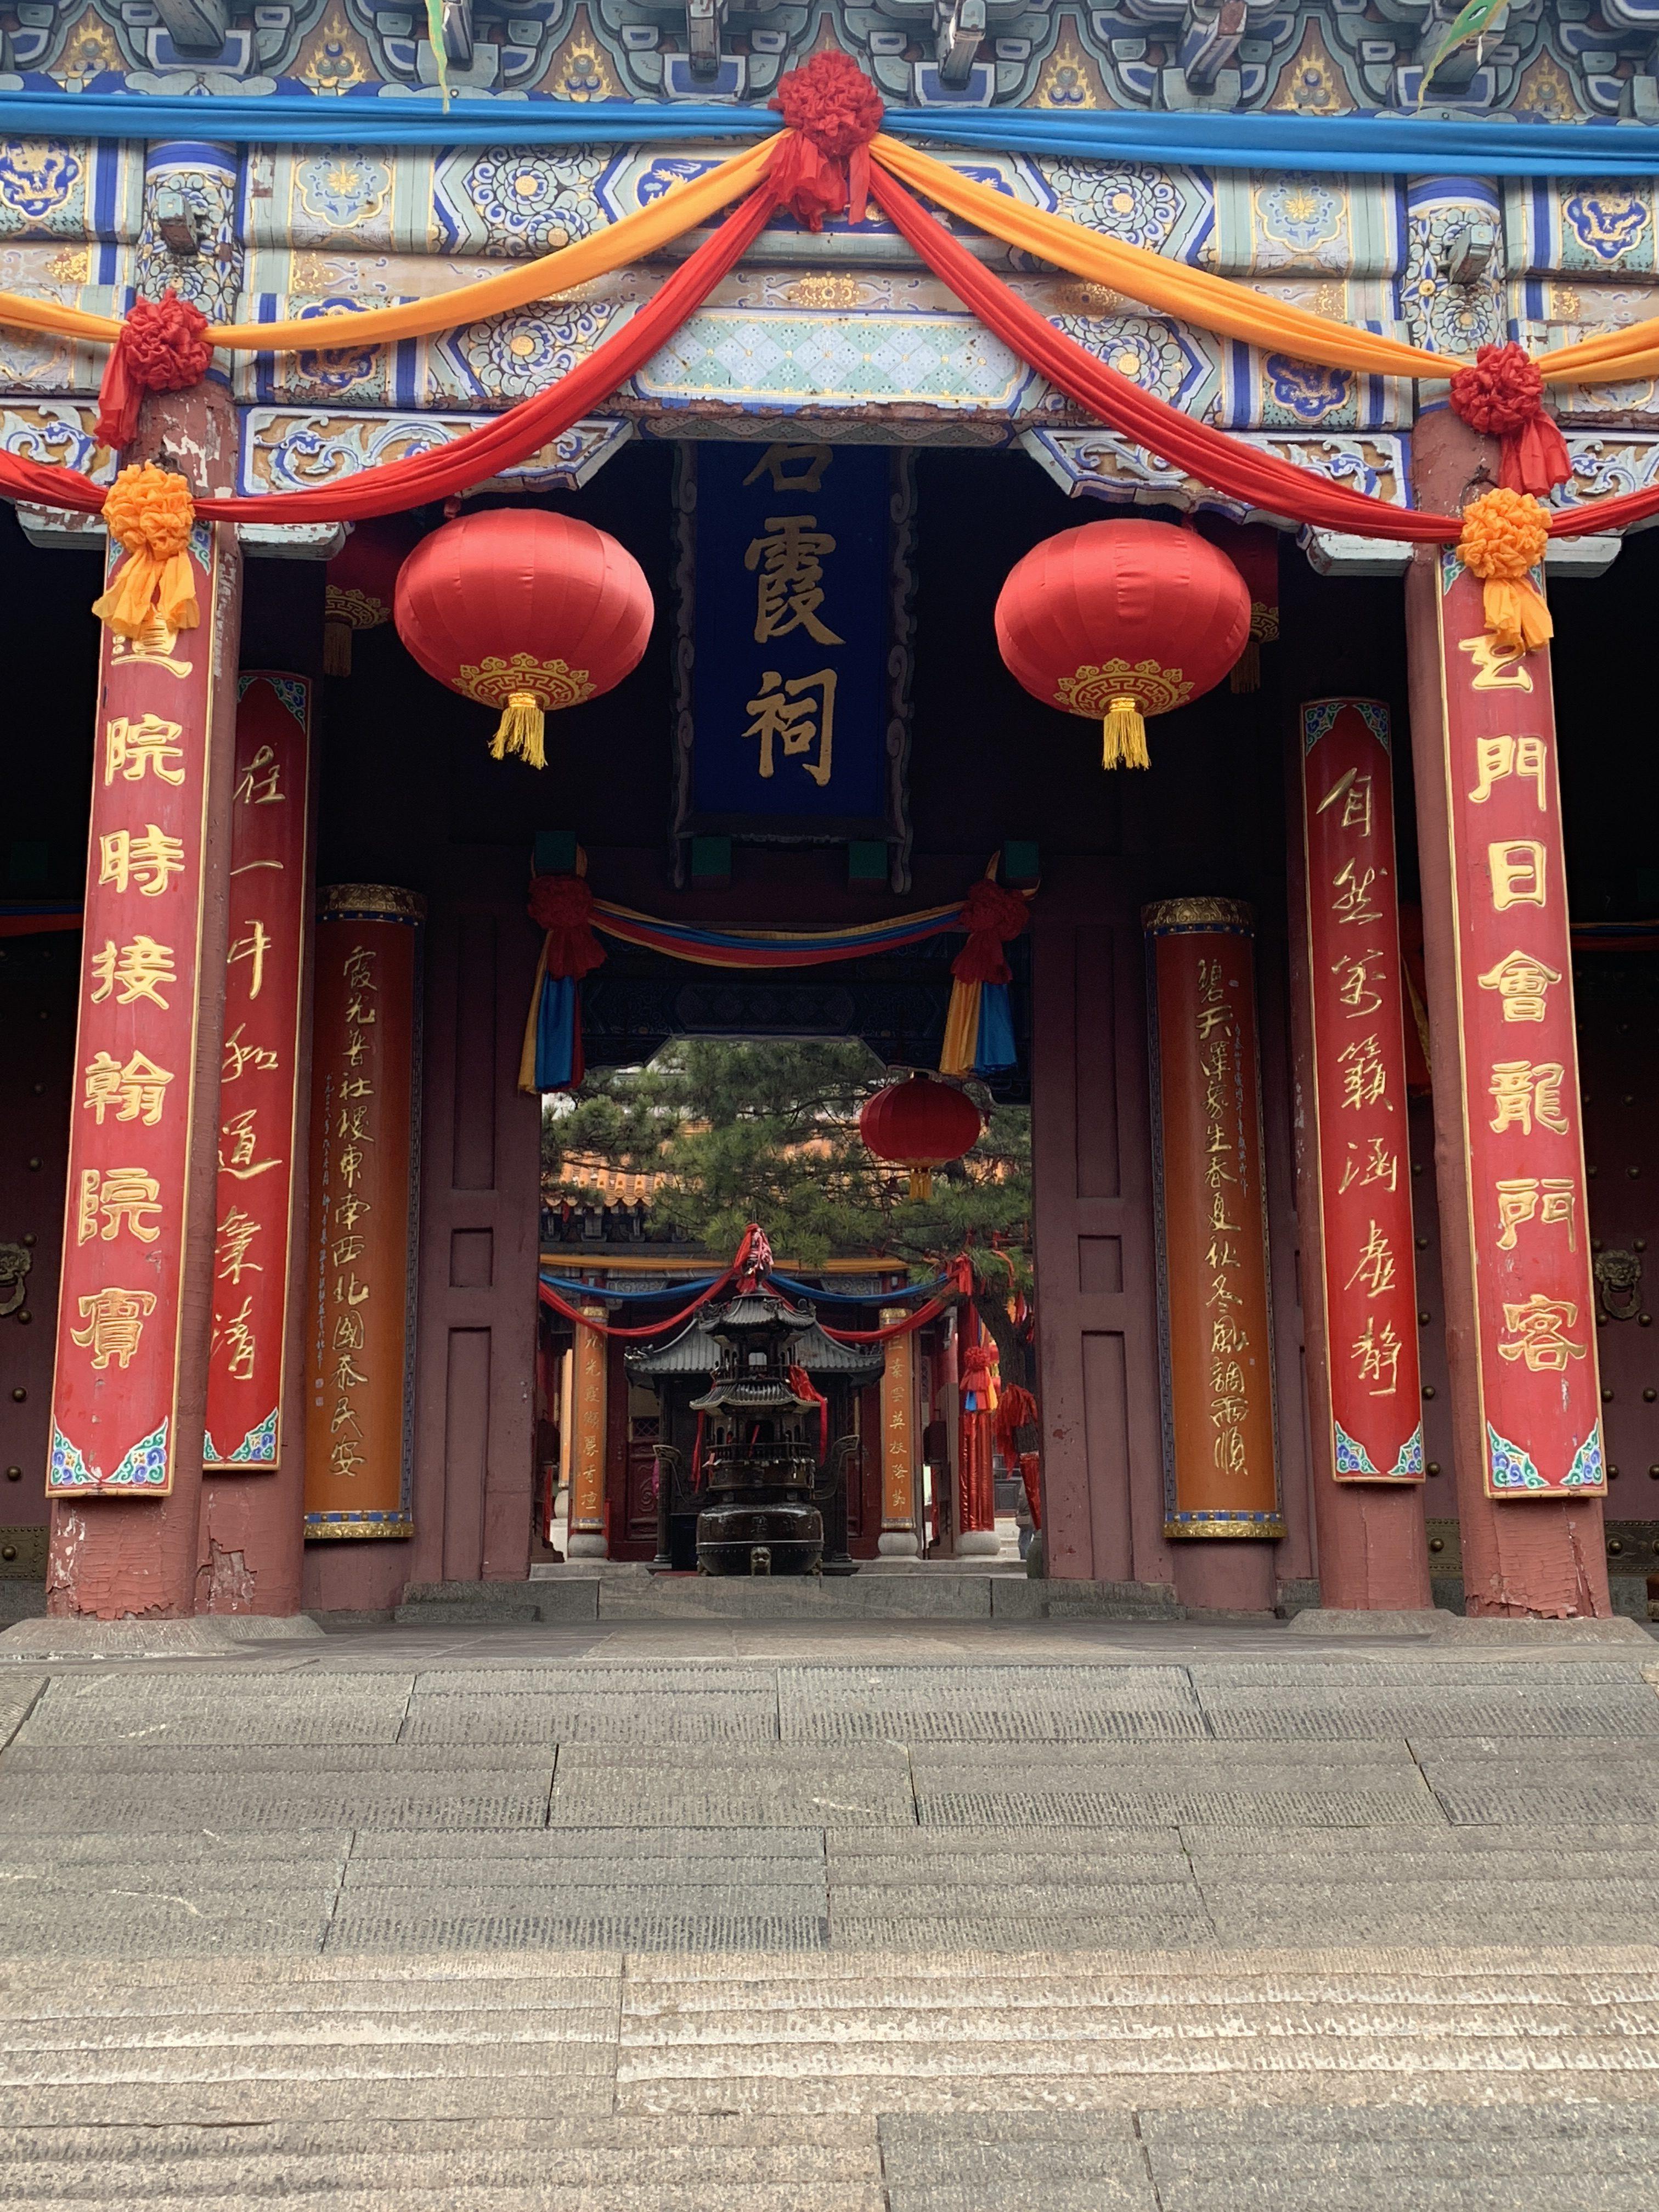 Shandong ornamental building